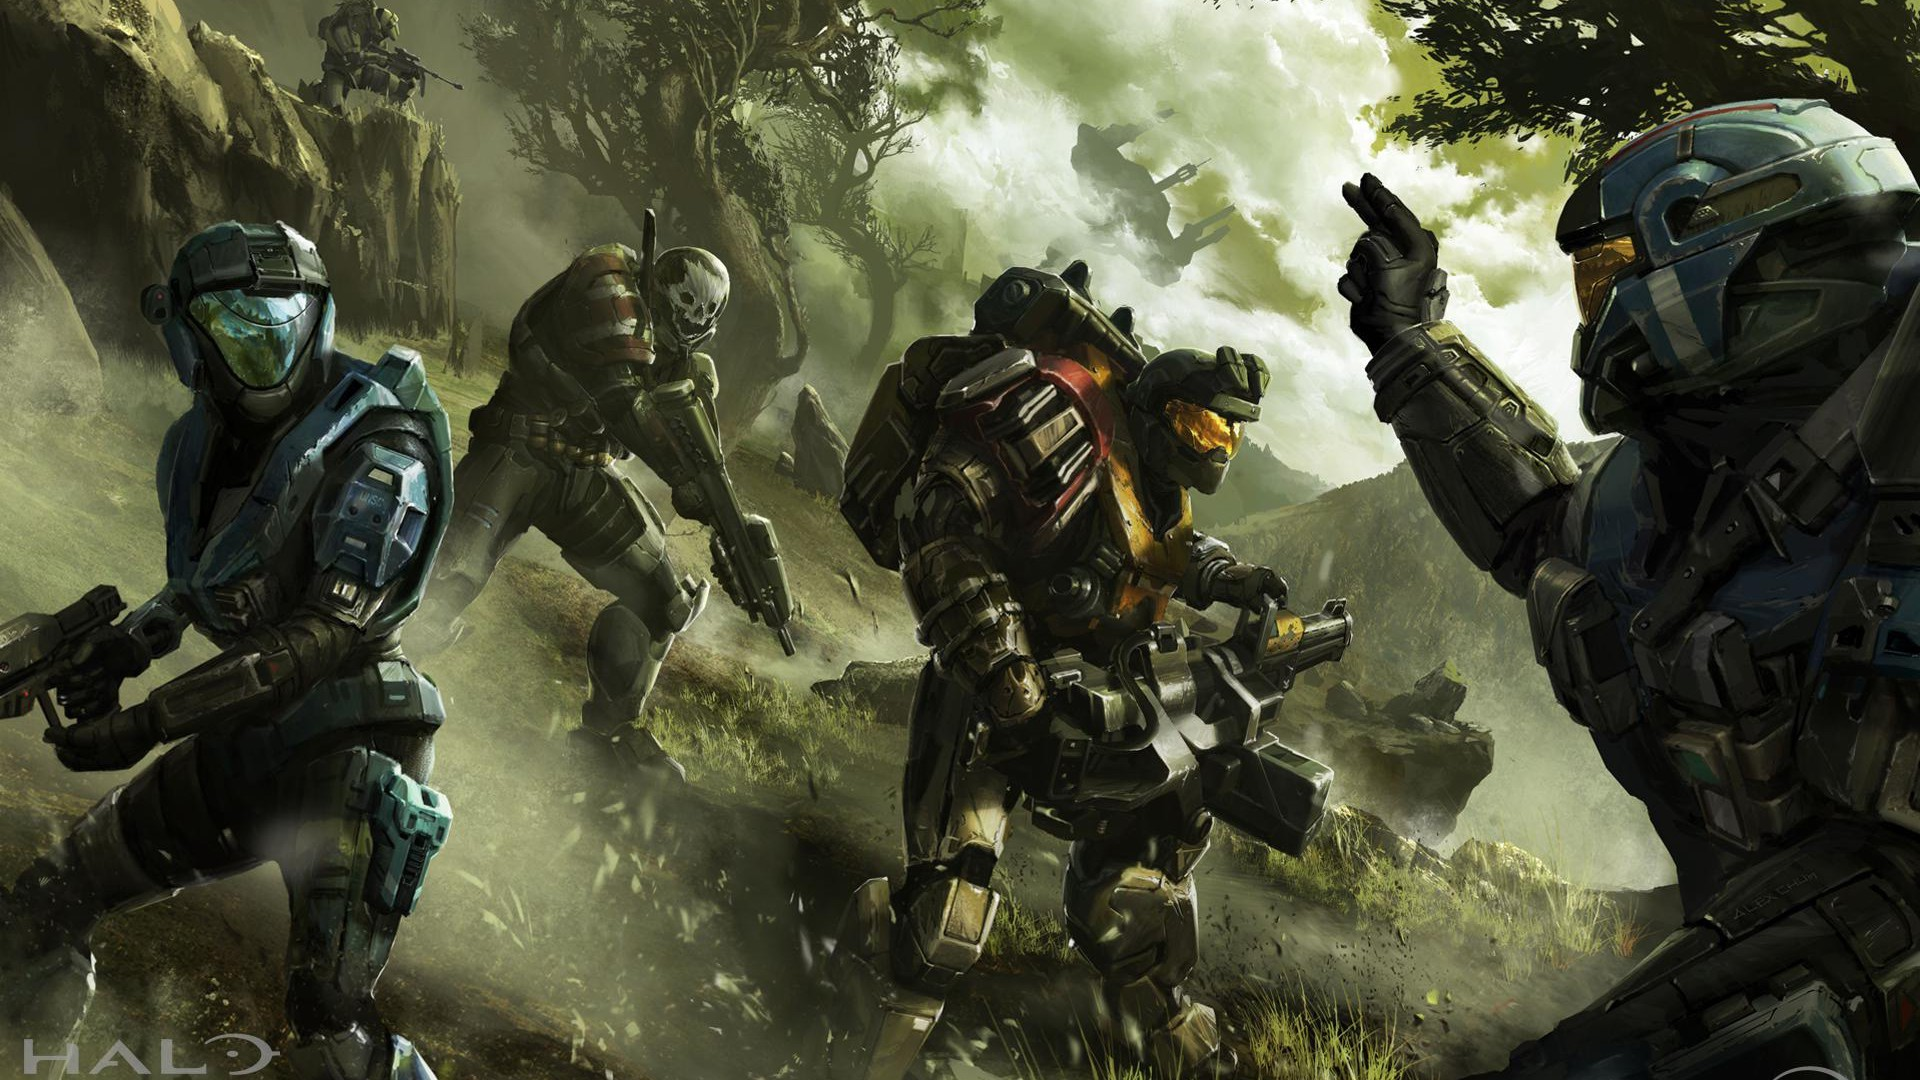 Halo Reach Wallpaper Hd 1080p